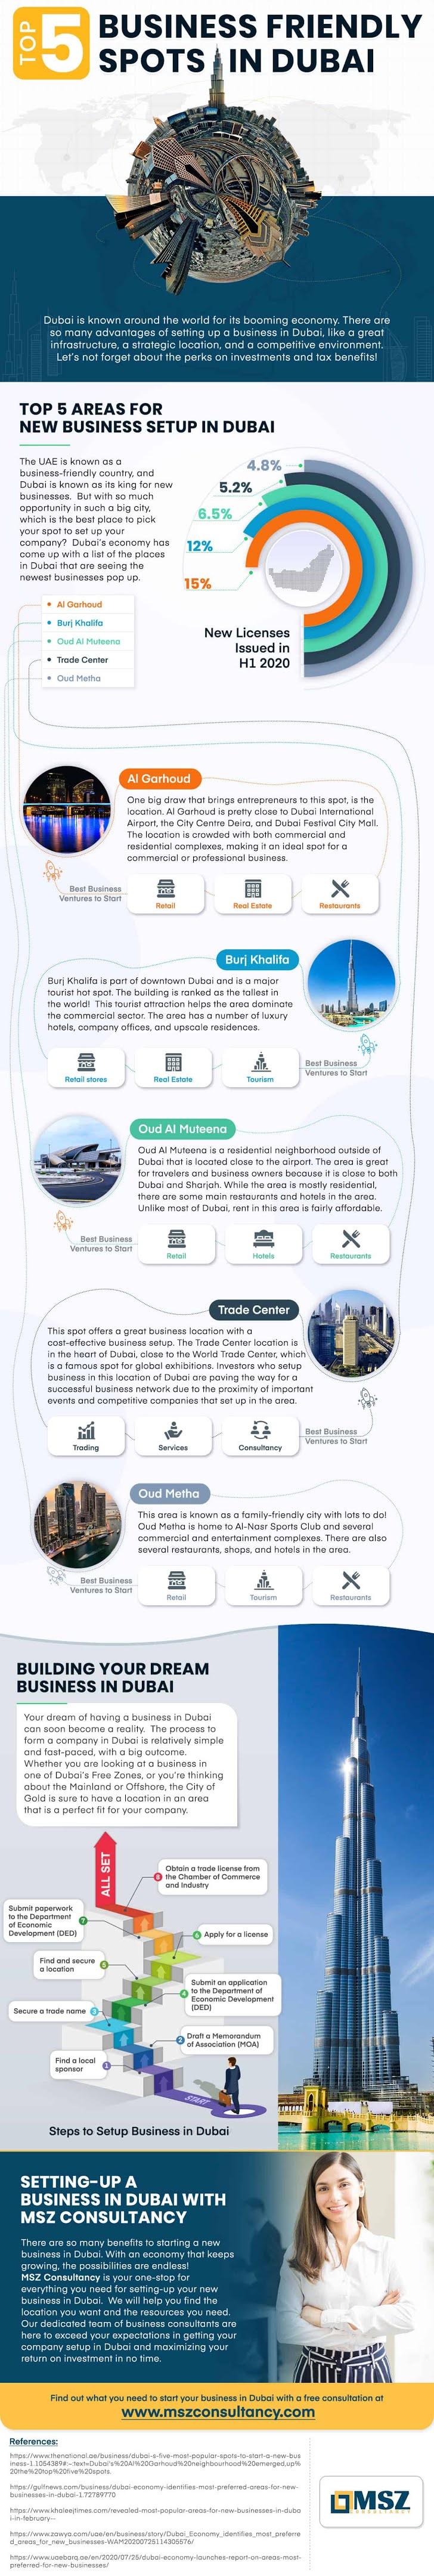 Top 5 Business-Friendly Spots in Dubai #infographic #Business #Dubai